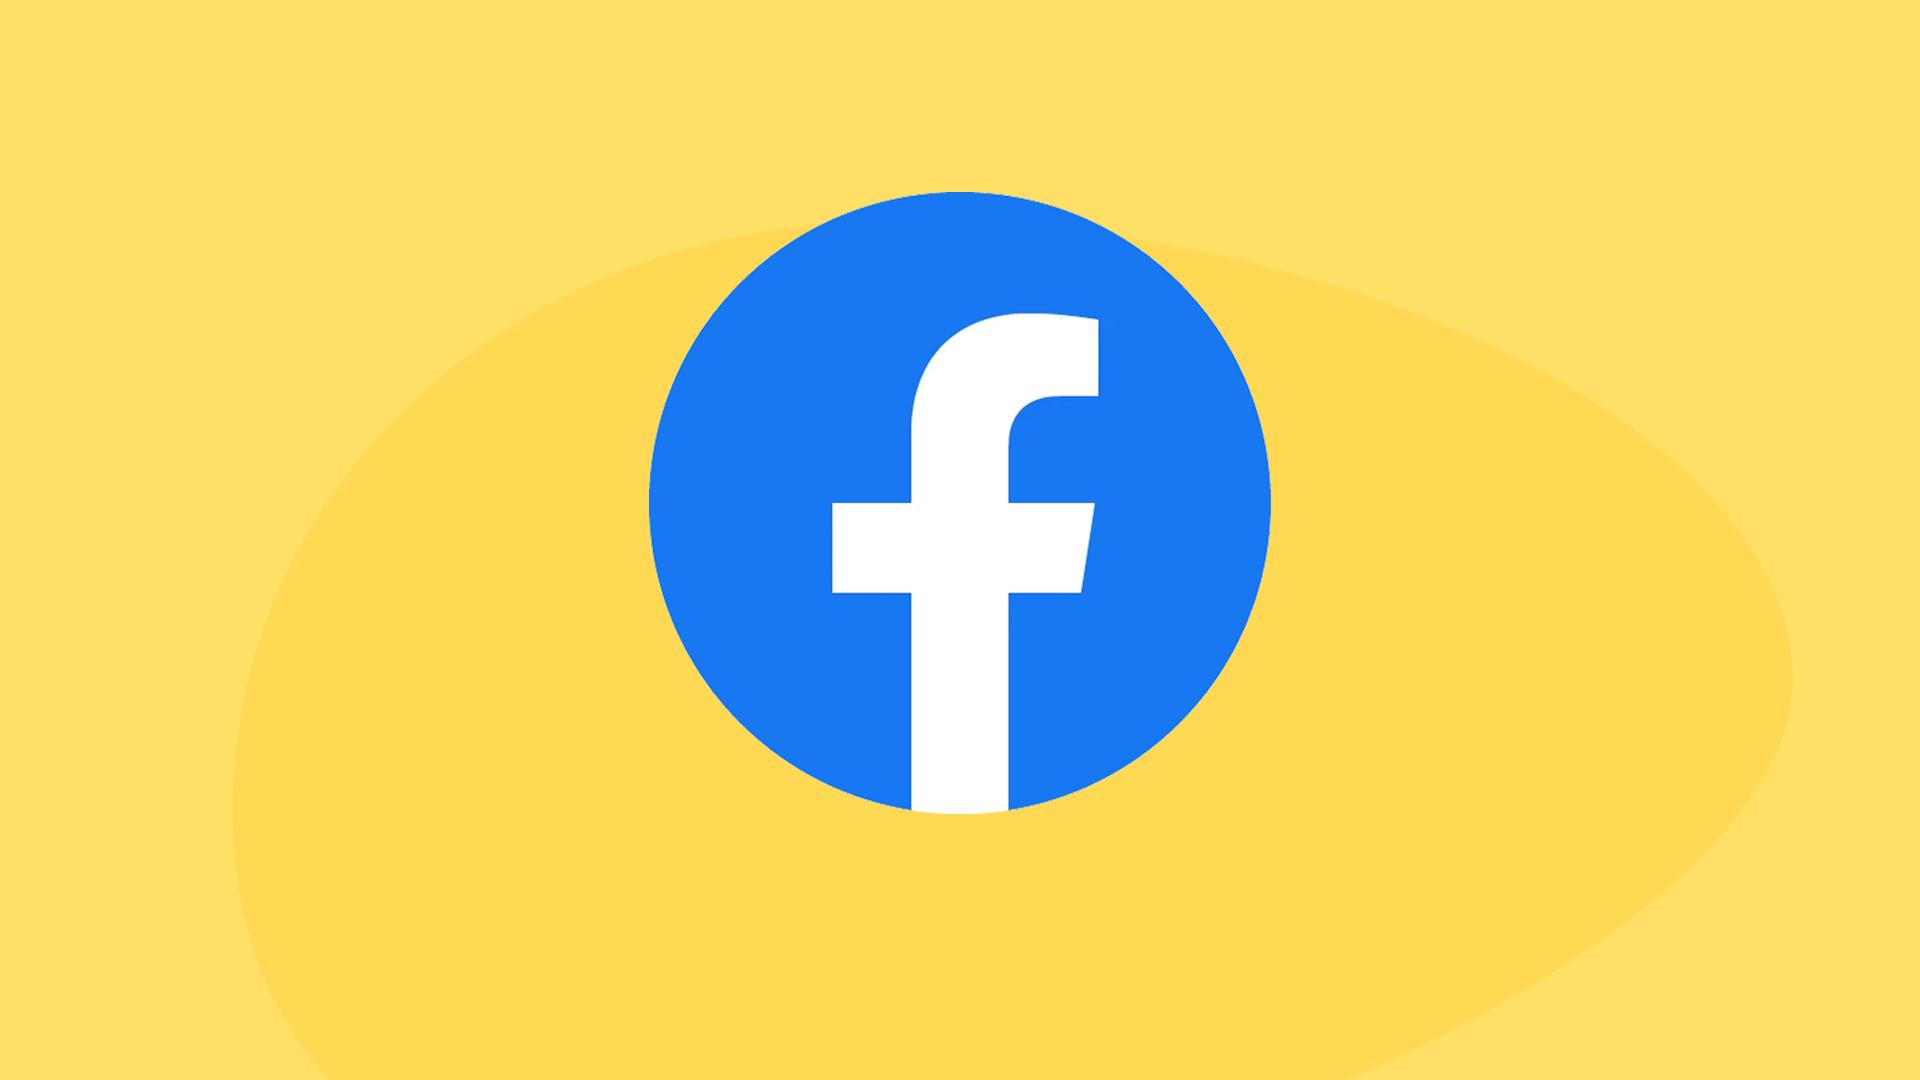 Facebook Antitrust Lawsuit - Company Forensics